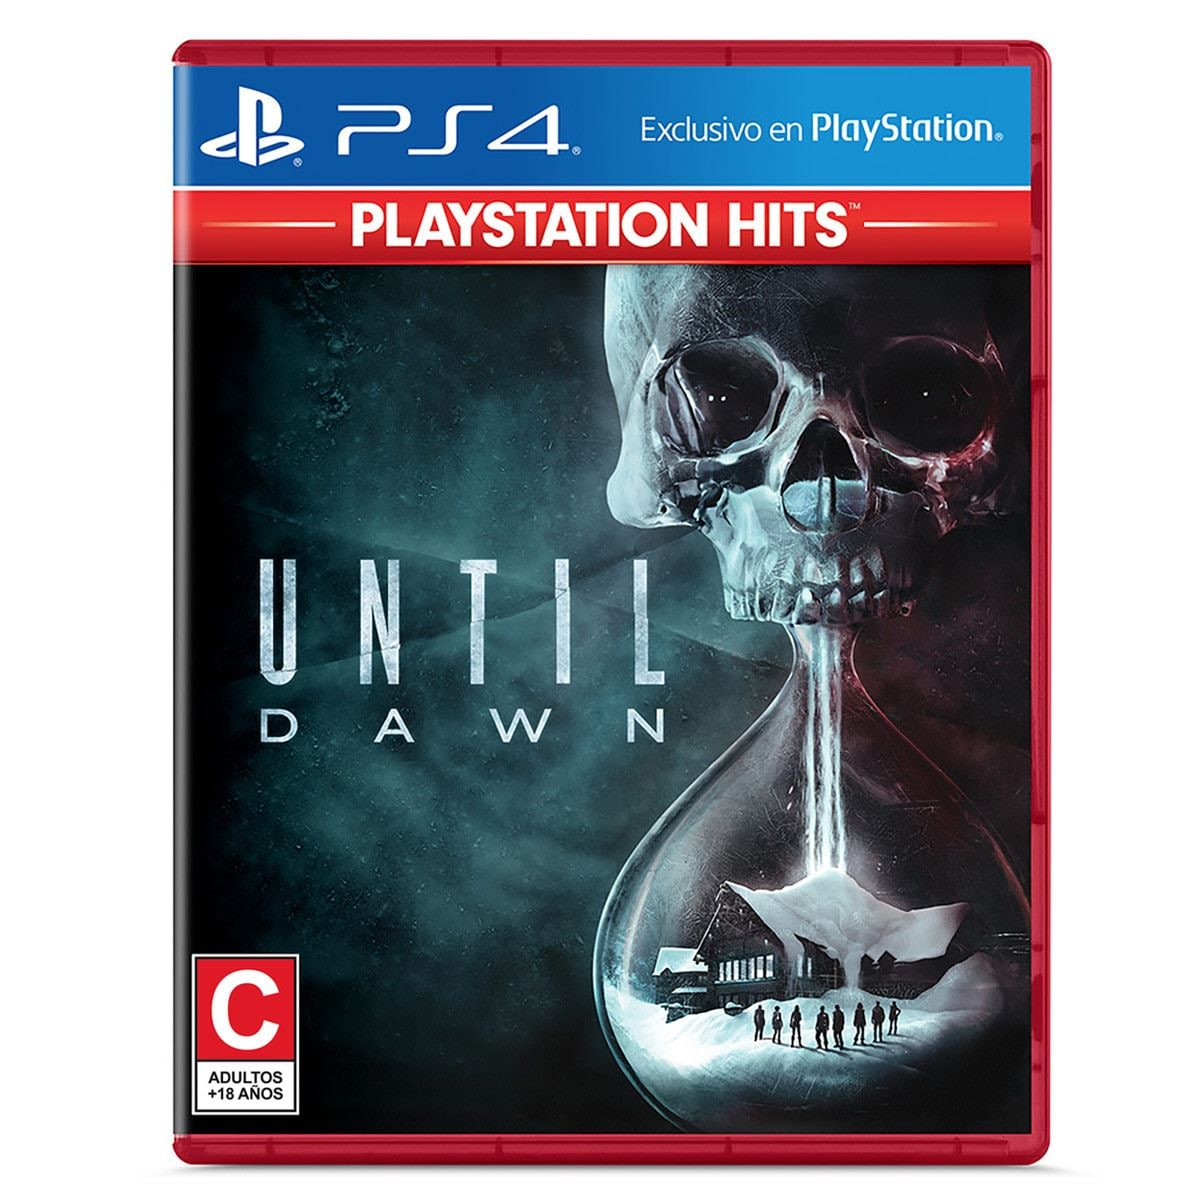 PS4 Hits Until Dawn